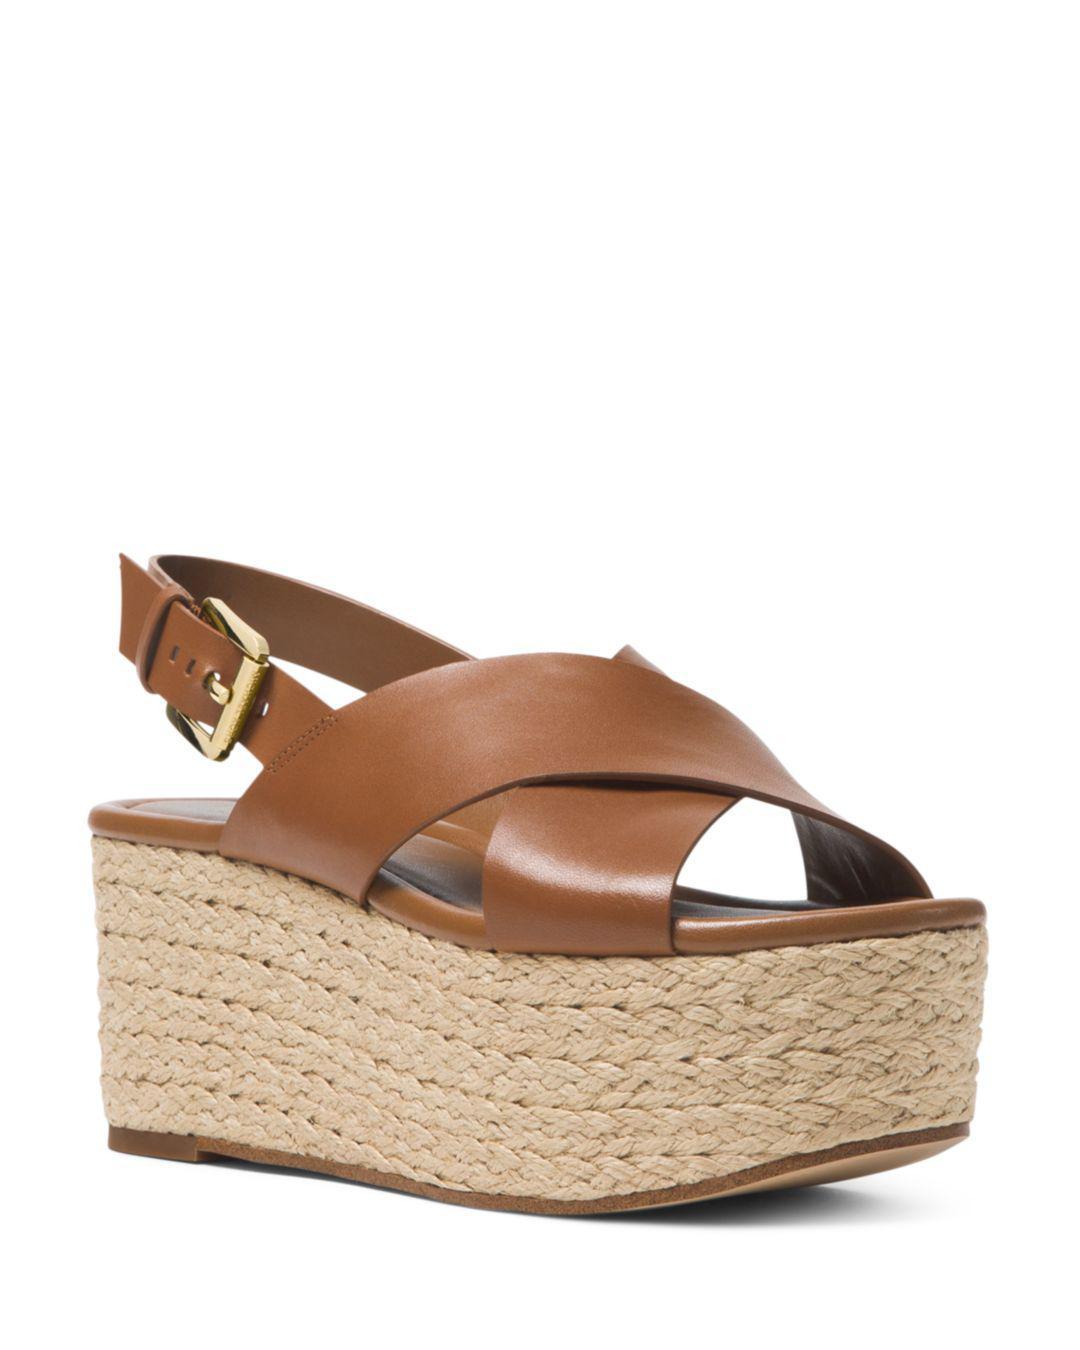 0b88343a585 MICHAEL Michael Kors Jodi Leather Platform Wedge Espadrille Sandals ...